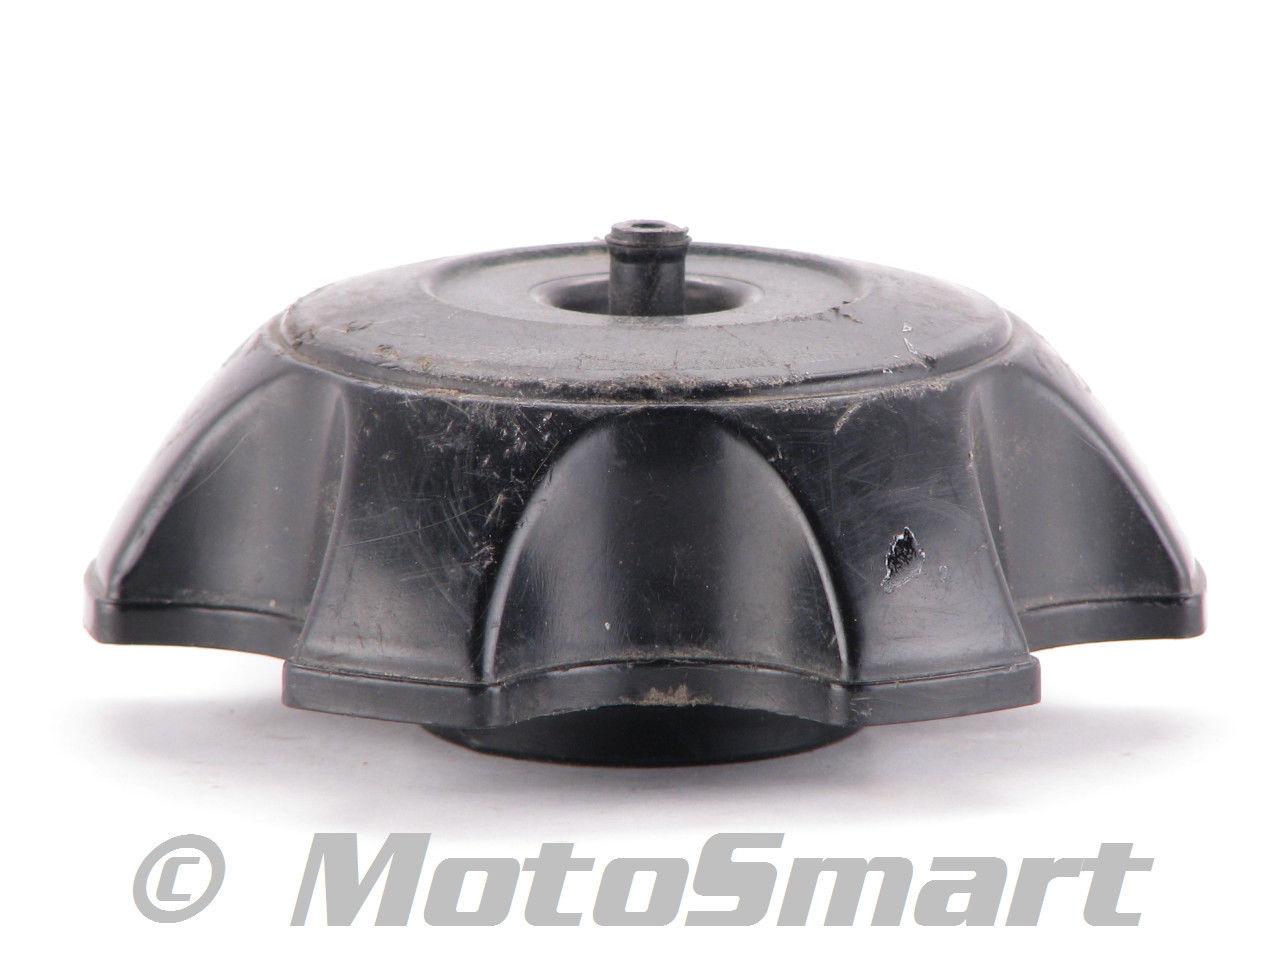 90-1990-Honda-CR500R-CR500-CR-500-R-Gas-Fuel-Tank-Cap-Good-Used-101002-280549050892